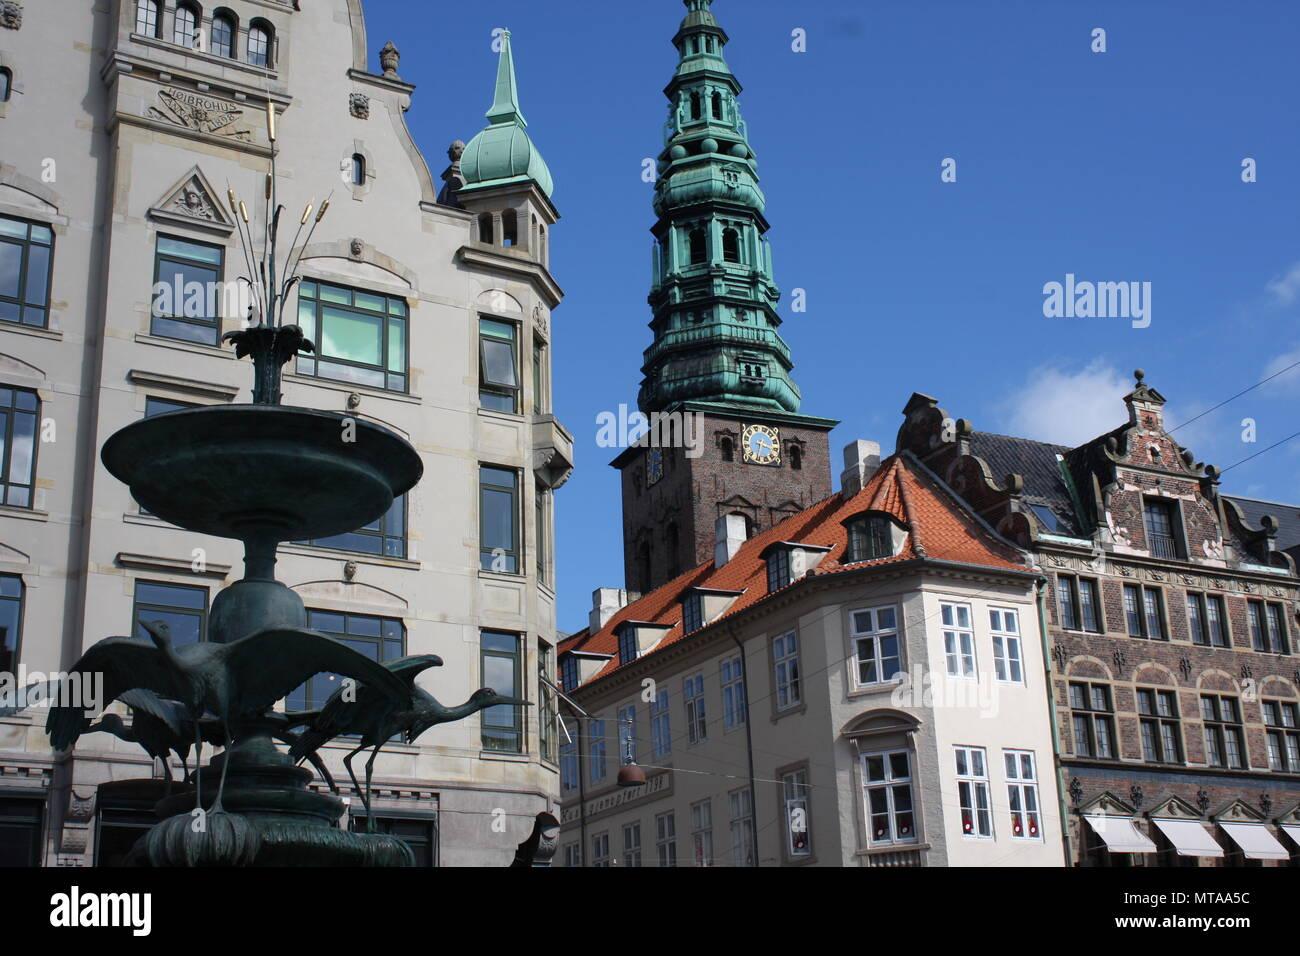 Amagertorv, central pedestrian area in Storkespringvandet, Copenhagen, Denmark with Stork Fountain - Stock Image